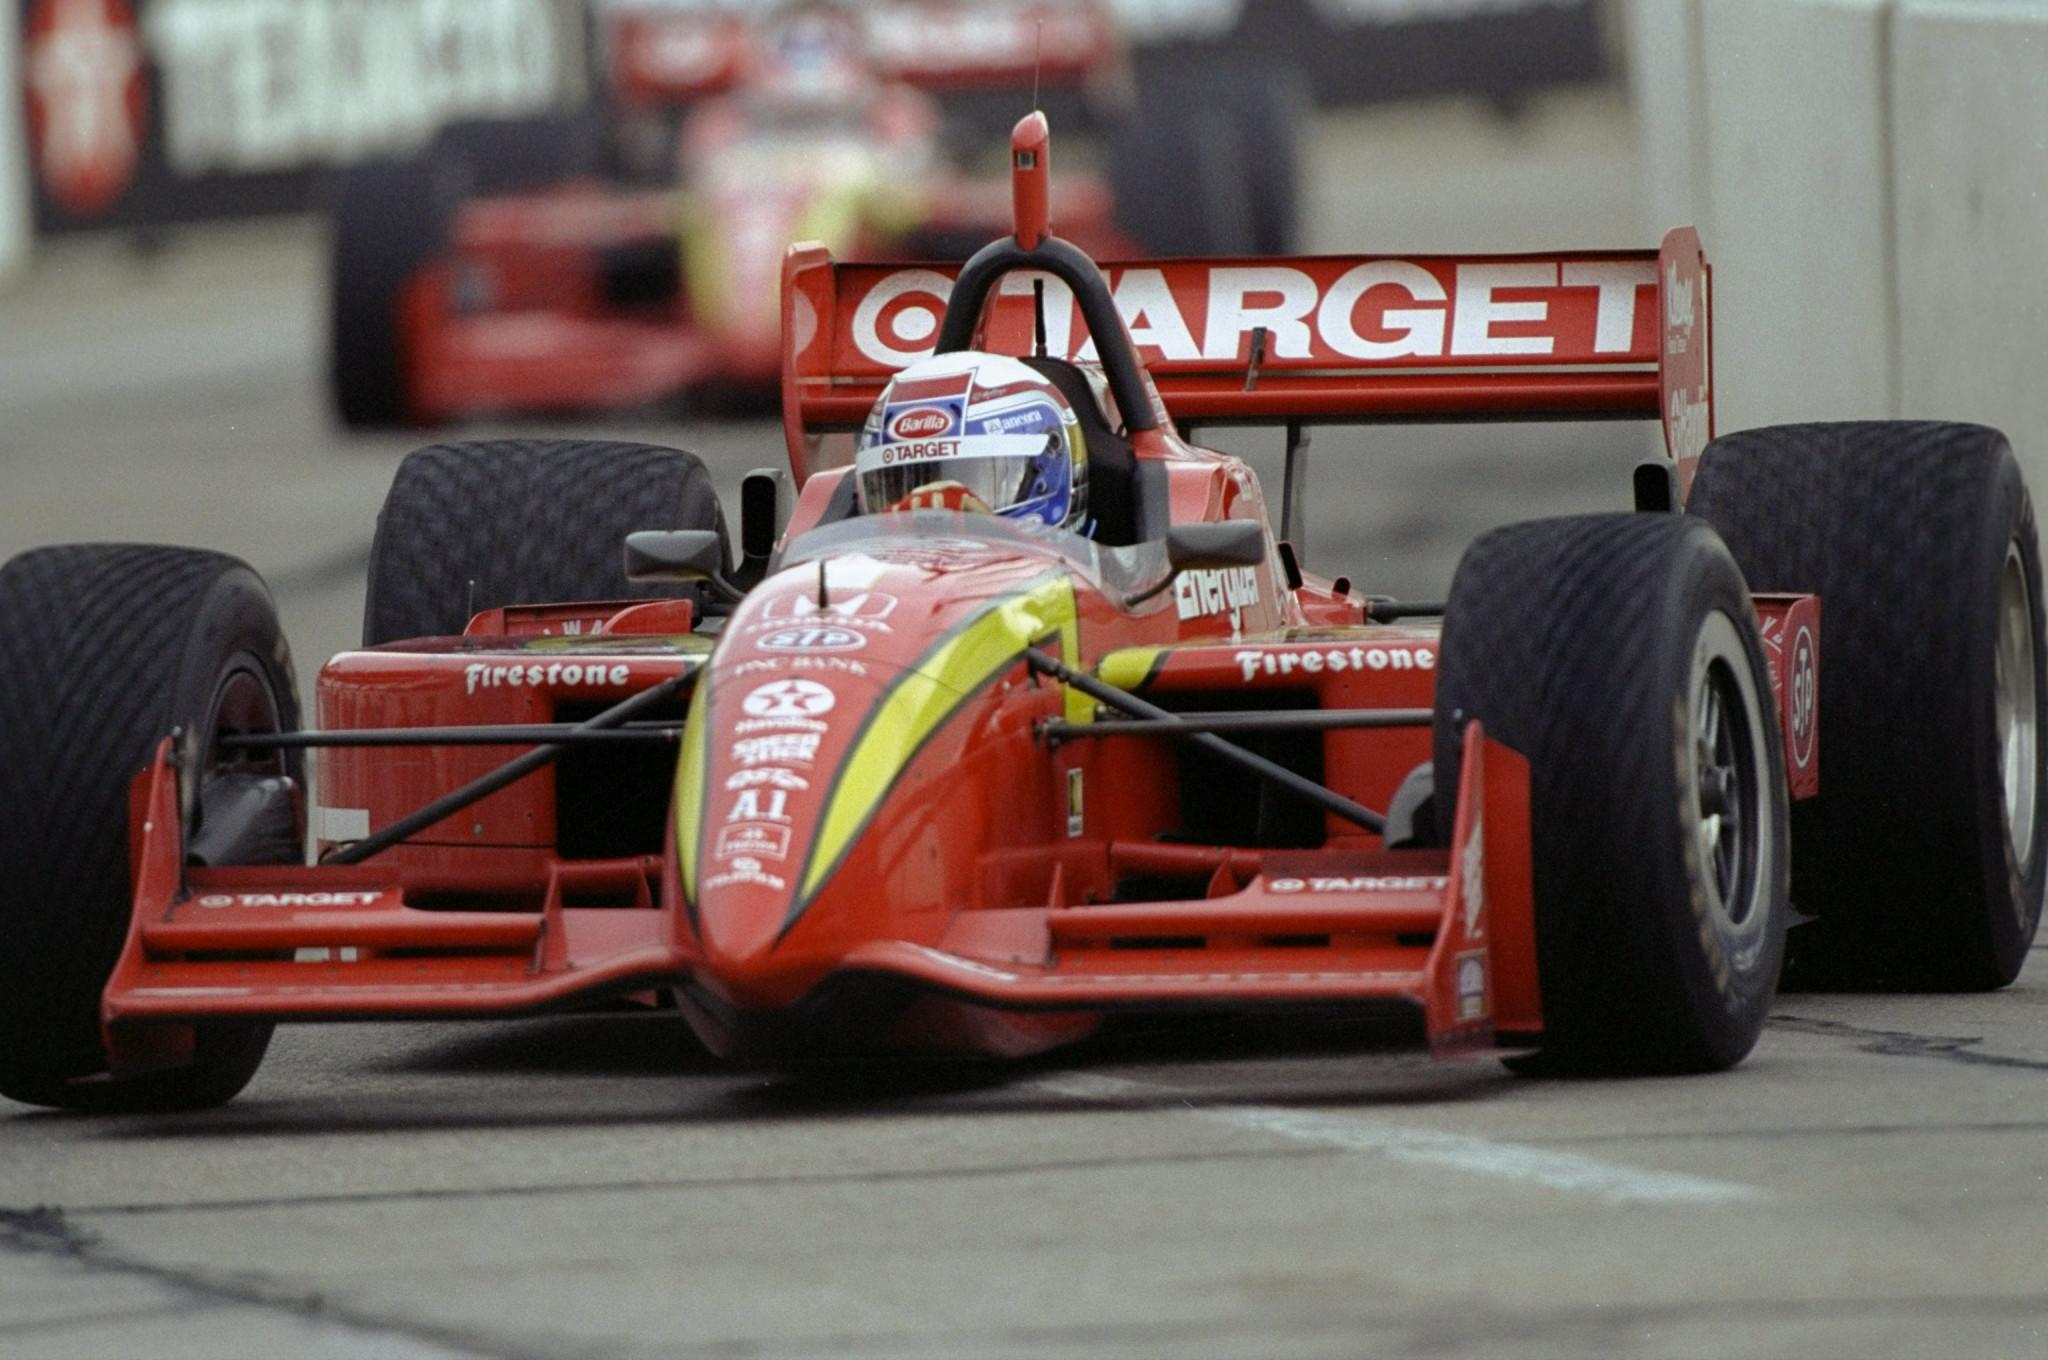 Alex Zanardi won the 1997 and 1998 CART titles driving for the Ganassi Reynard-Honda team ©Getty Images